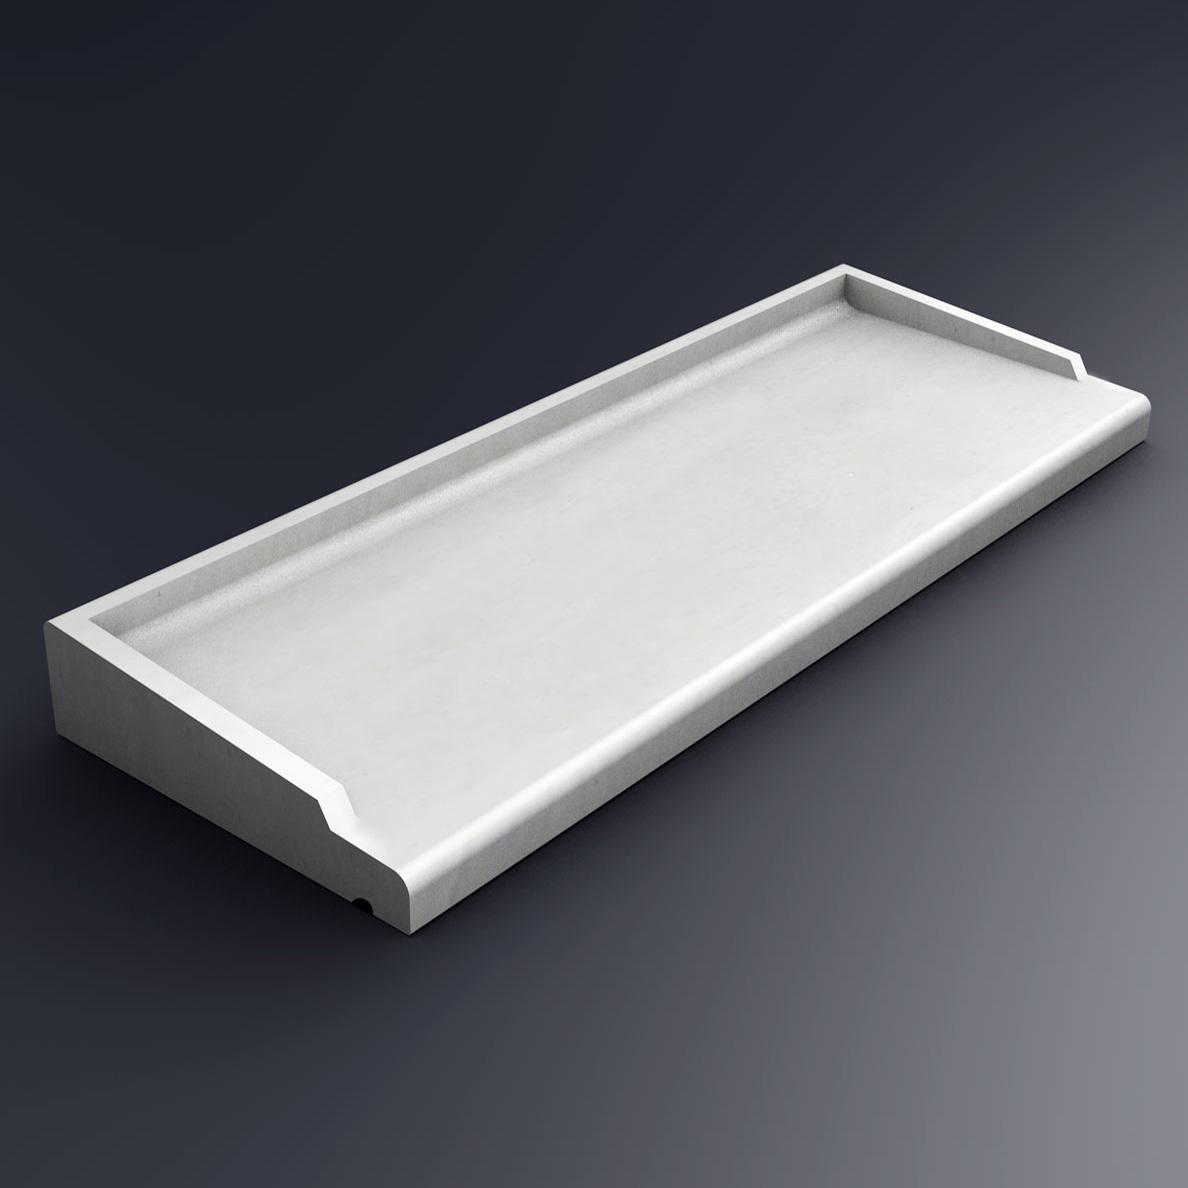 pose d un appui de fenetre beton interesting poser appui. Black Bedroom Furniture Sets. Home Design Ideas